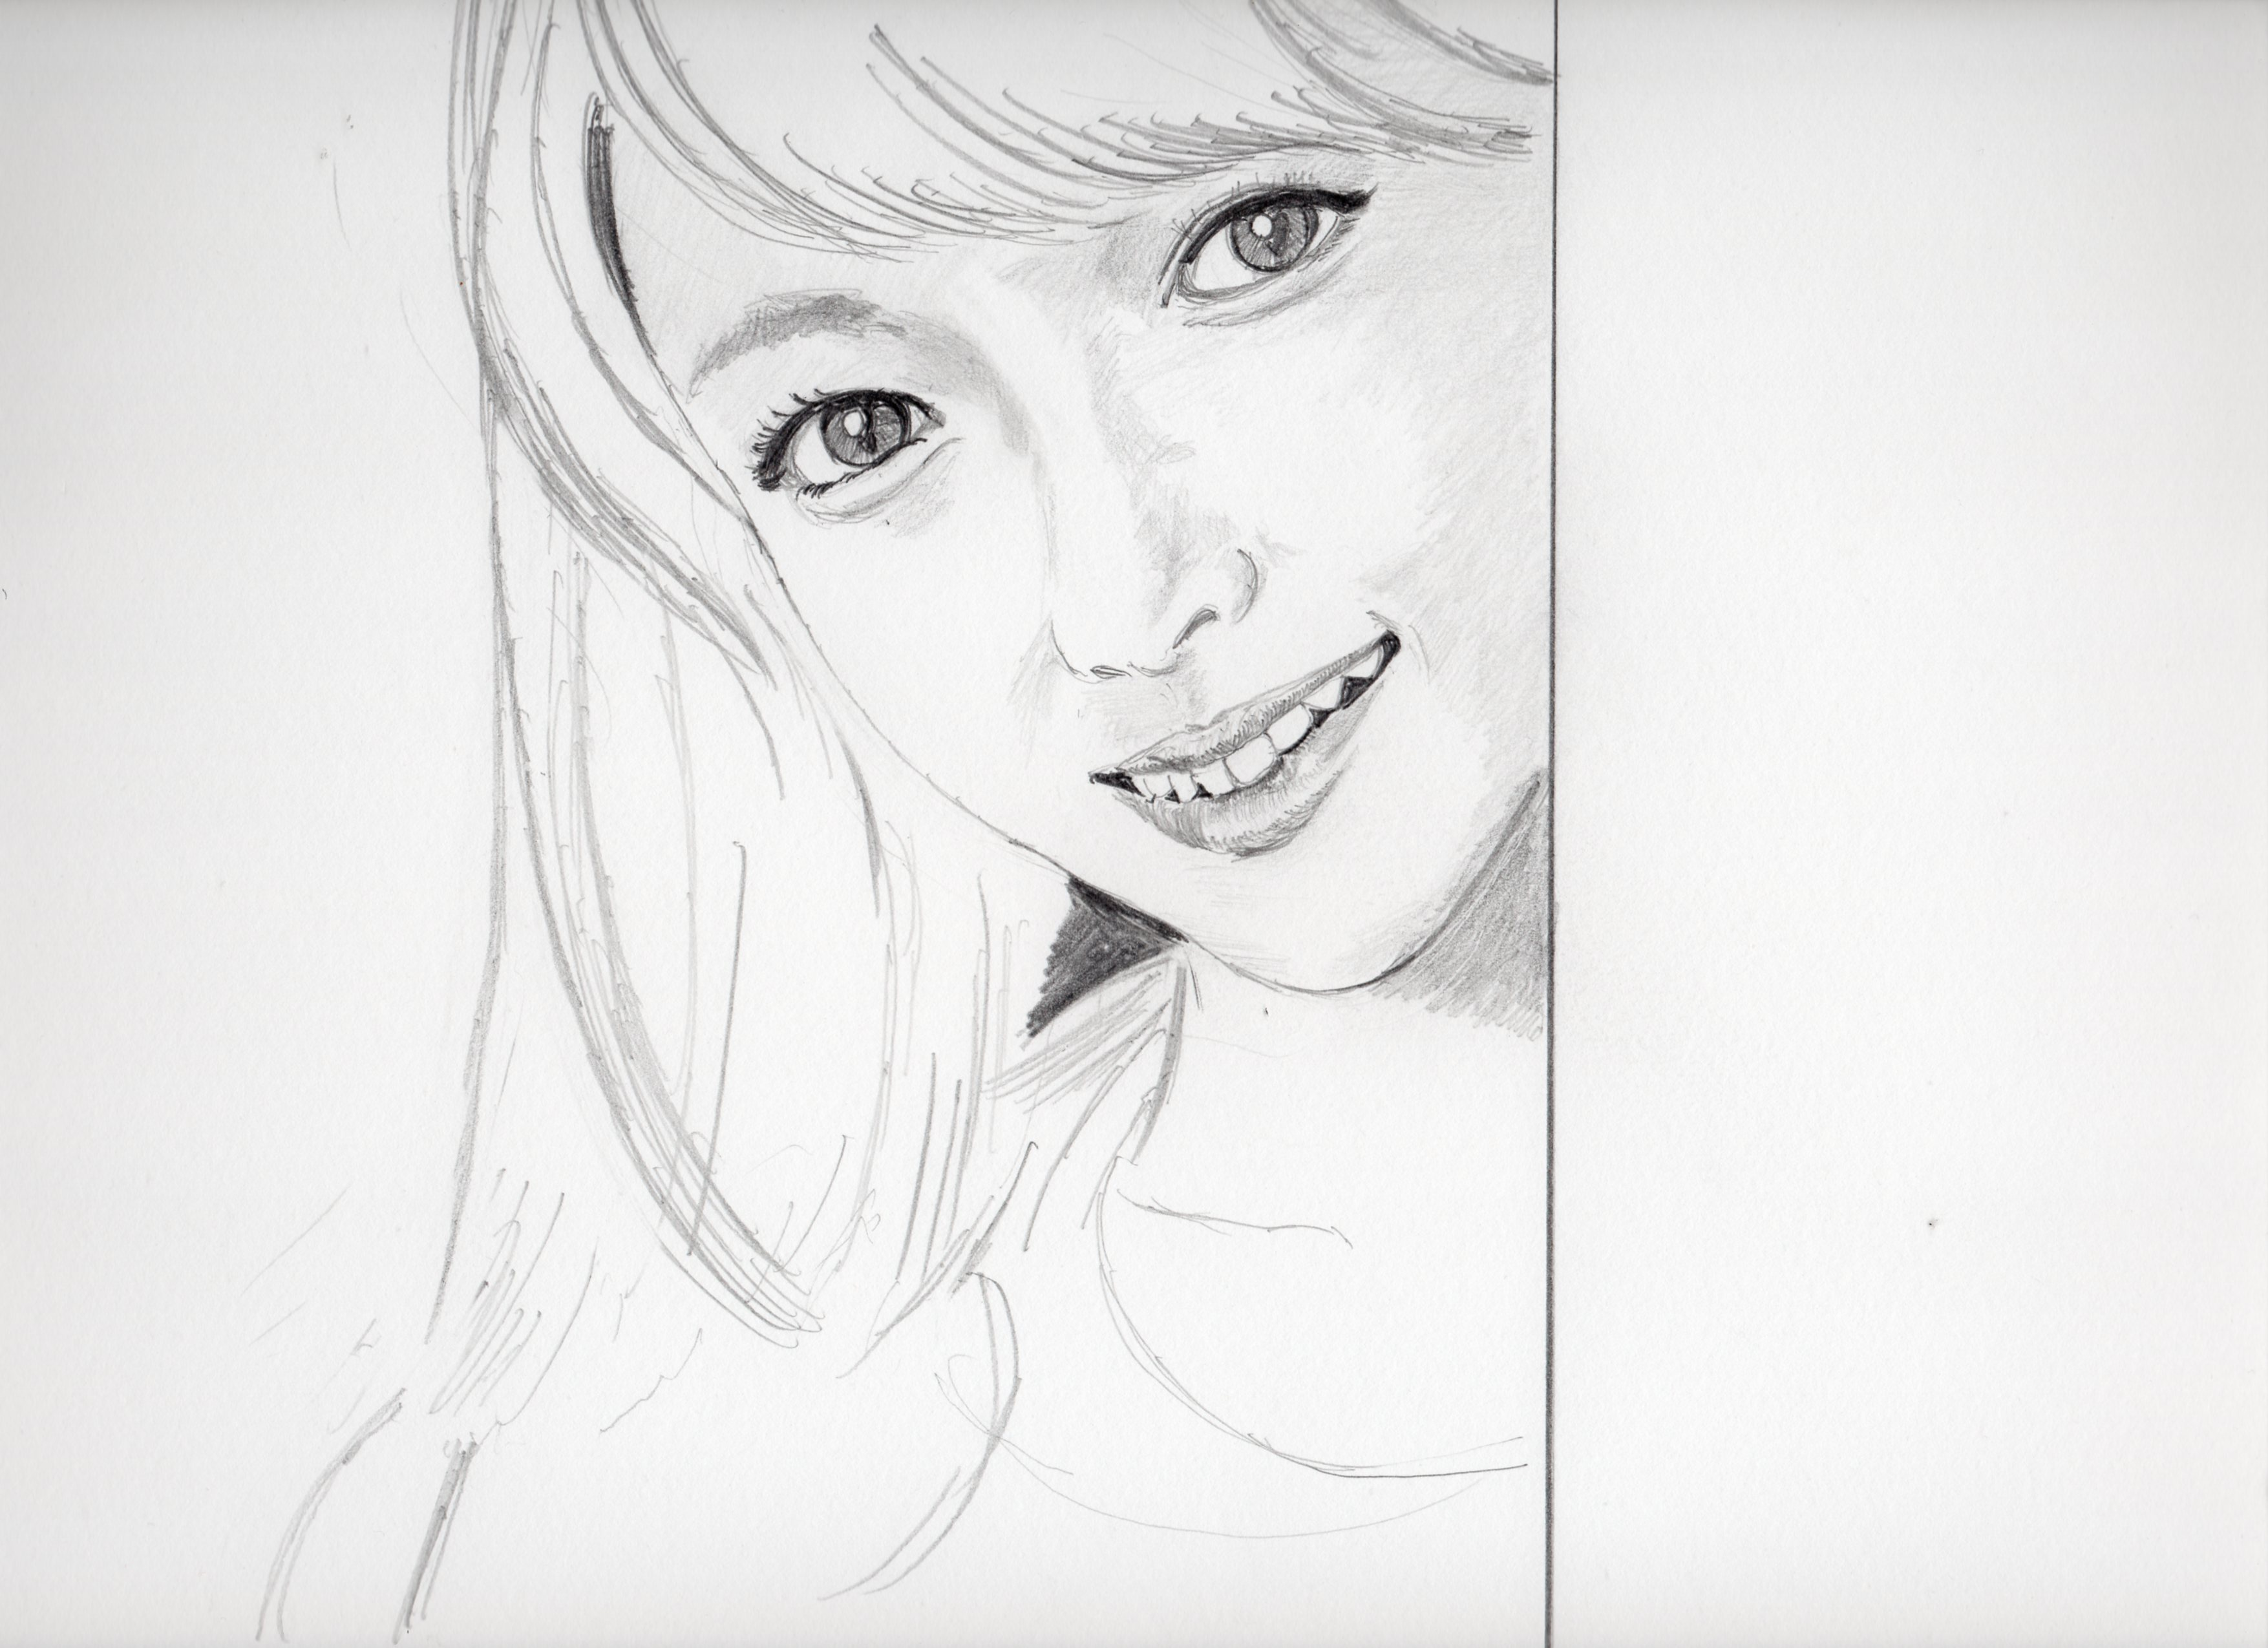 深田恭子の鉛筆画似顔絵途中